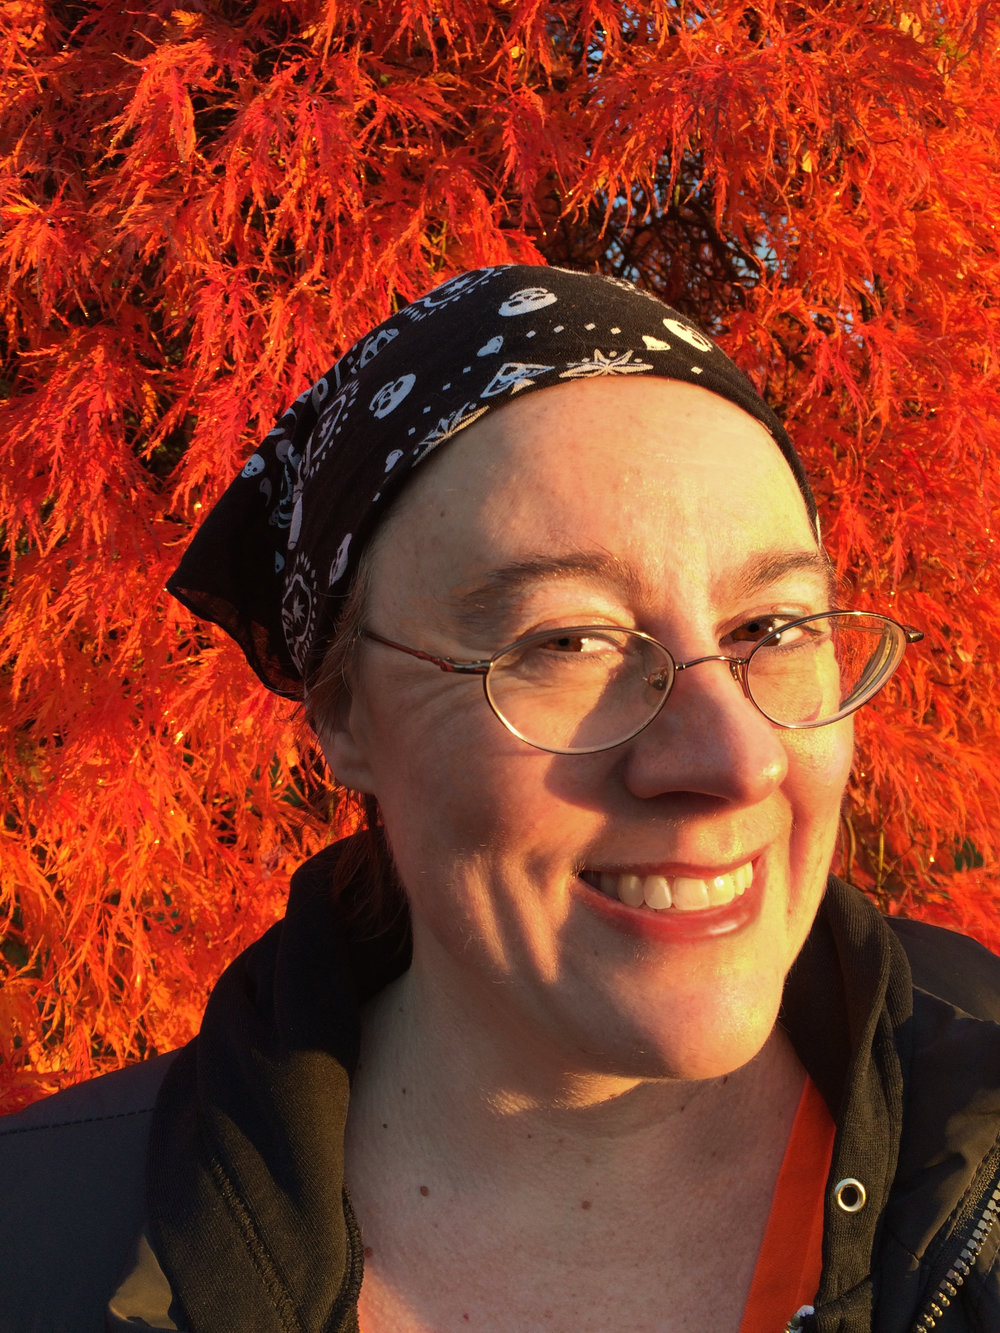 Nicole Kimberling, Editor in Chief